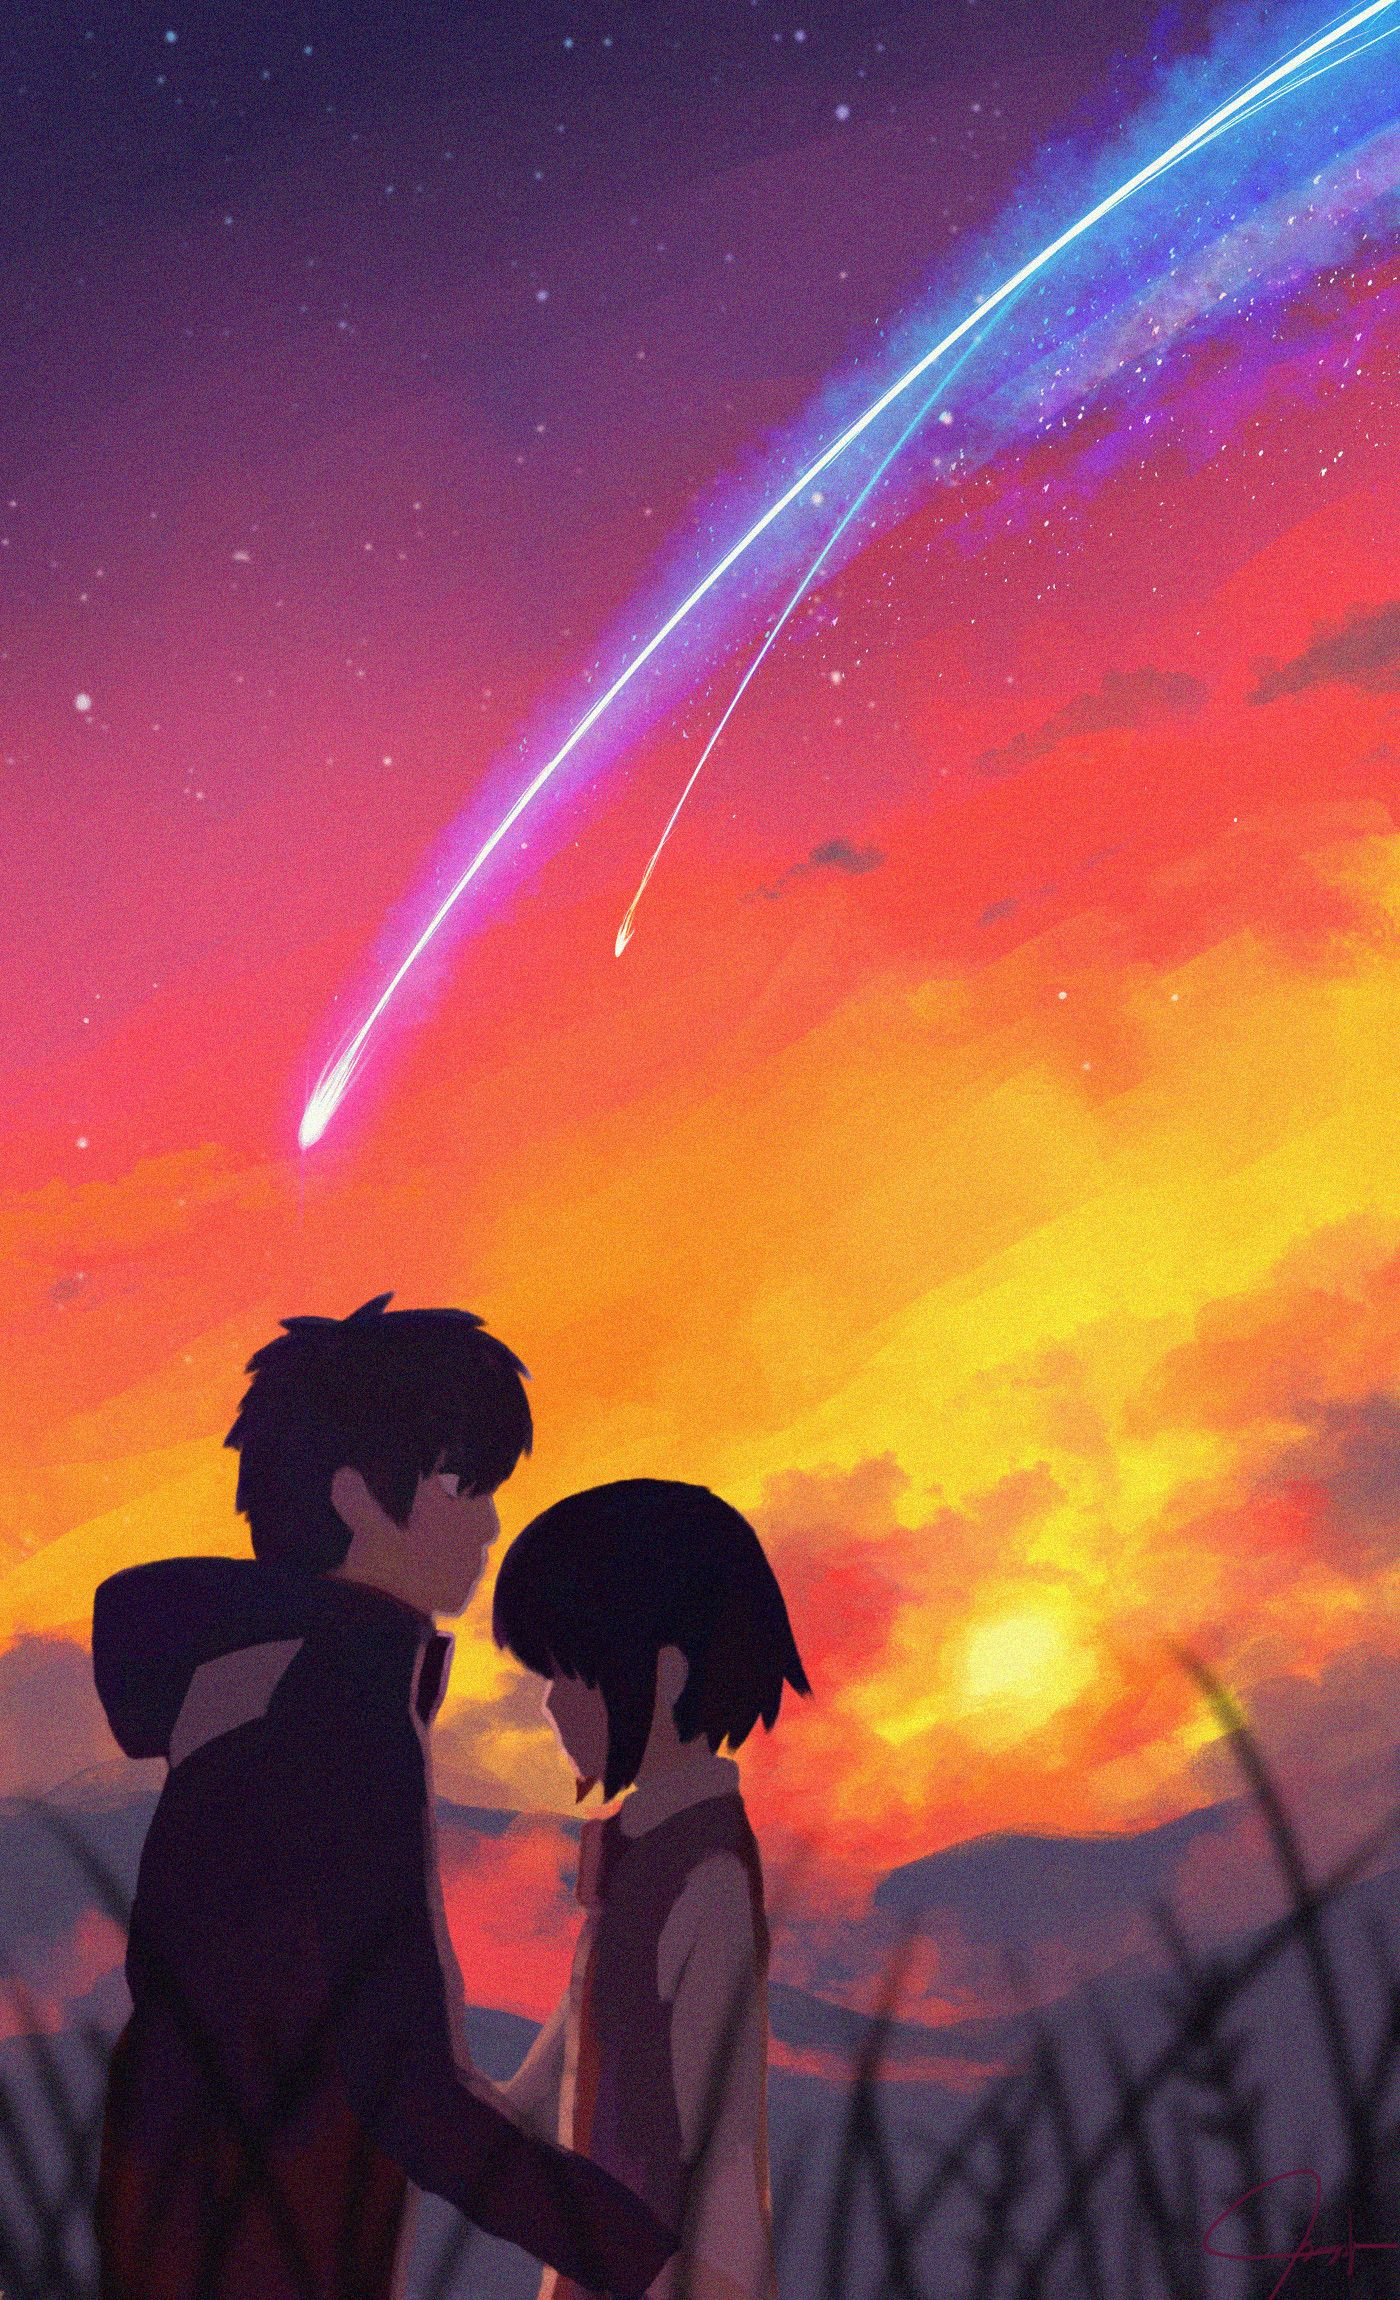 ArtStation Your Name(Kimi no nawa) Fan art, Gericho